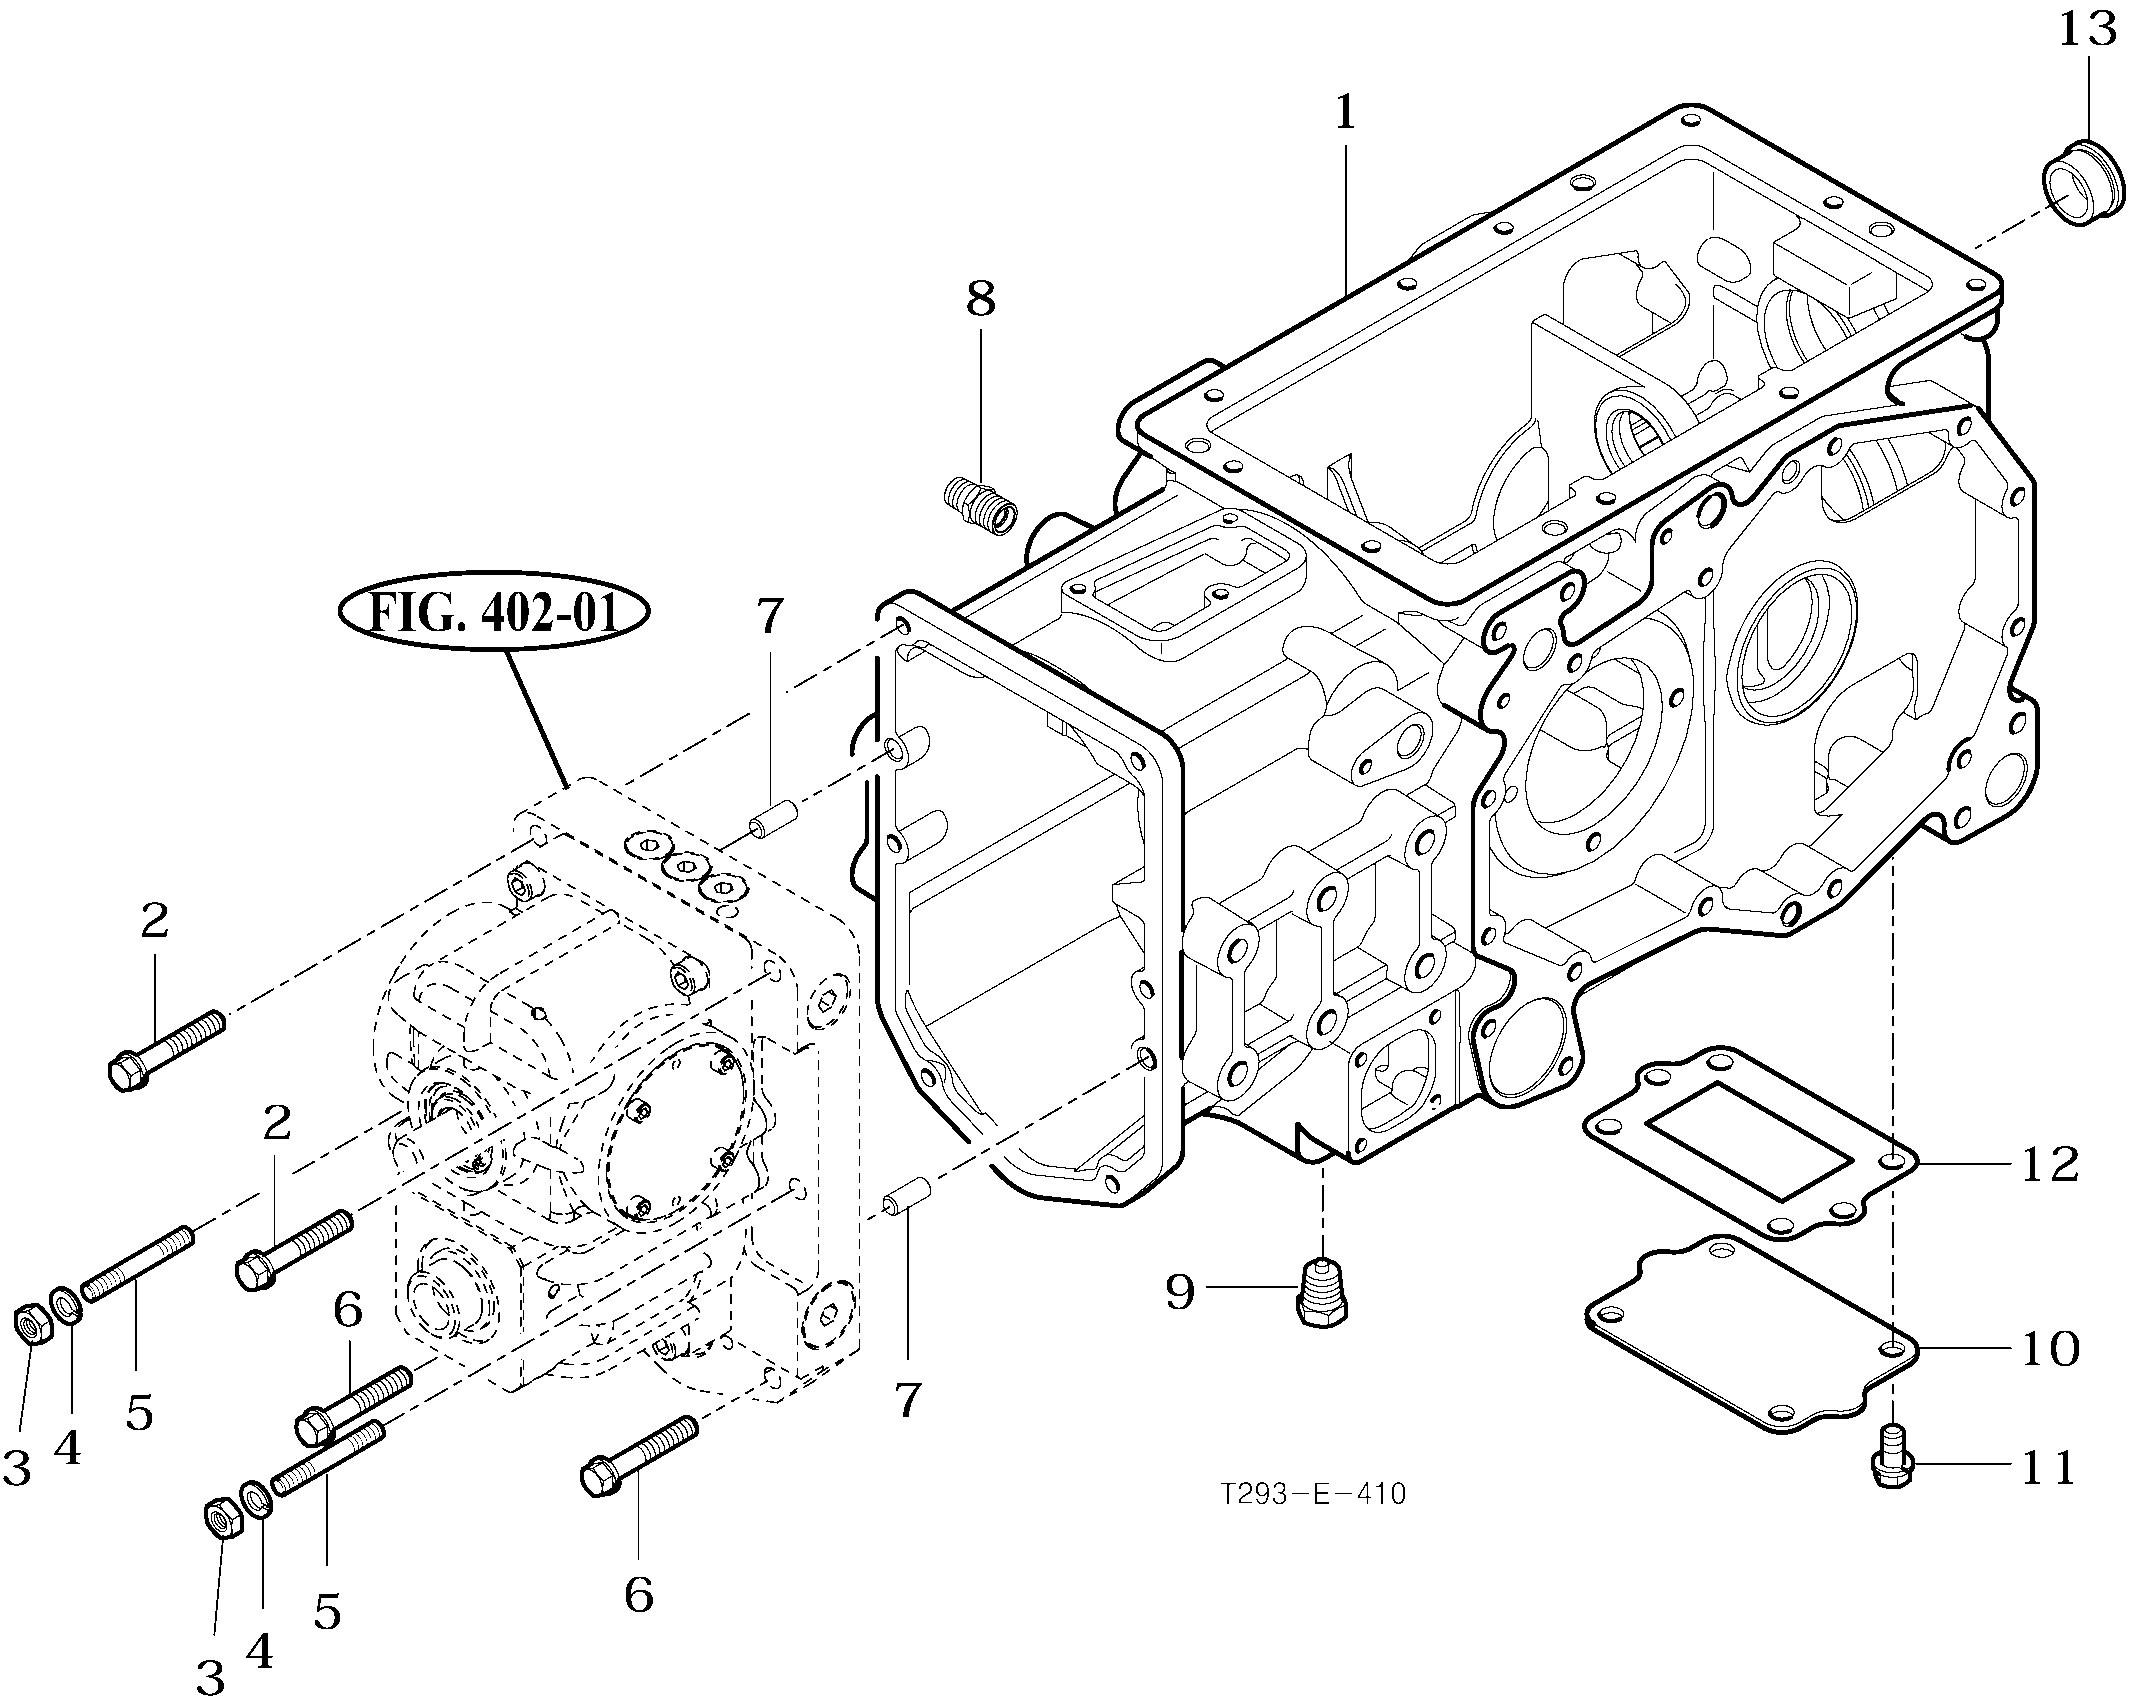 Diagram Of A Transmission Rear Transmission Case T293 Tym Tractors Of Diagram Of A Transmission